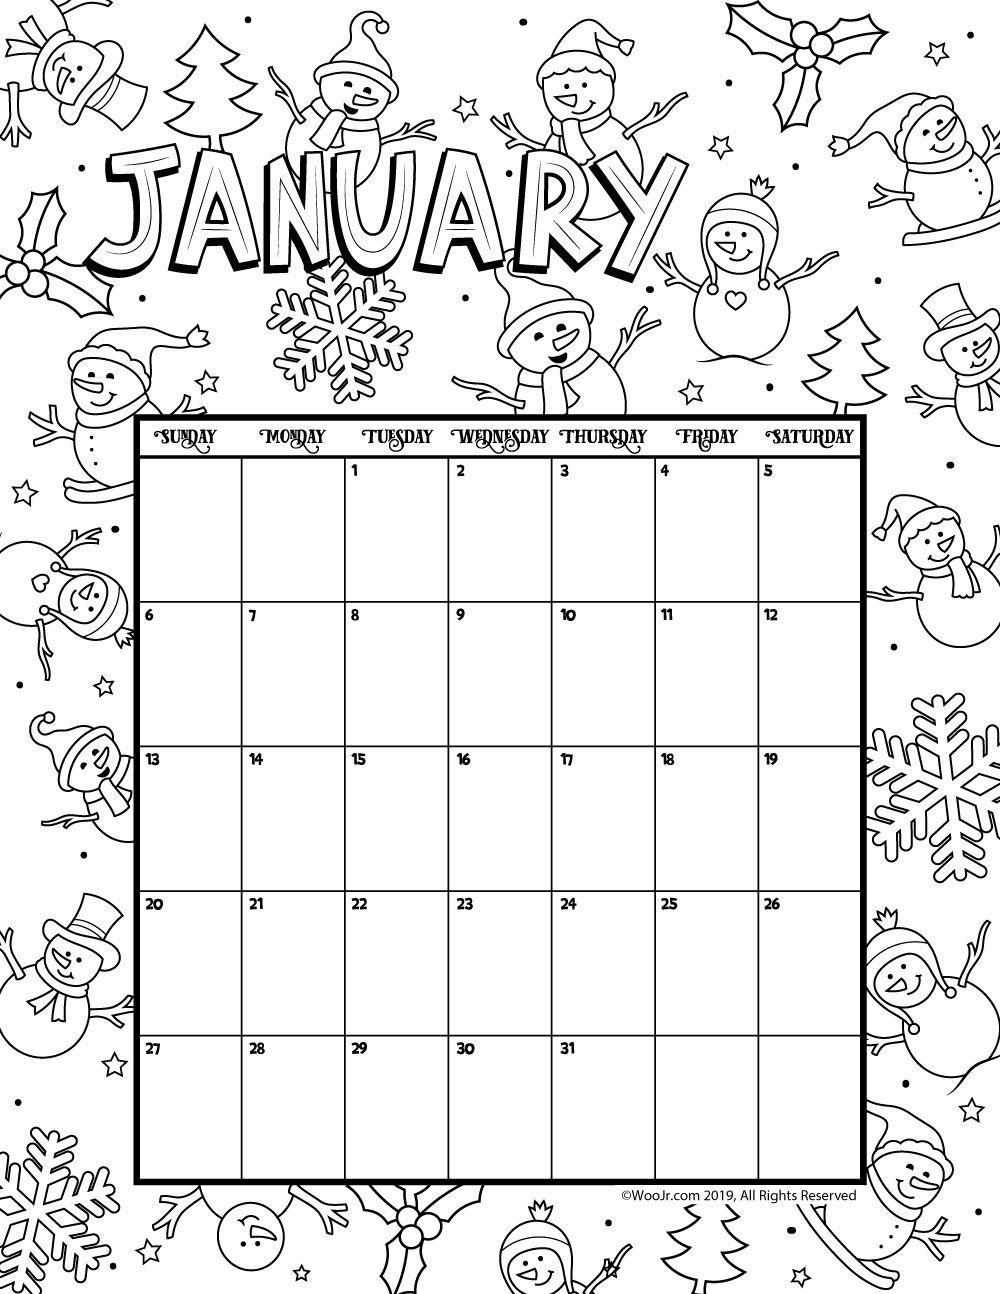 January 2019 Coloring Calendar Woo Jr Kids Activities Coloring Calendar Kids Calendar January Calendar